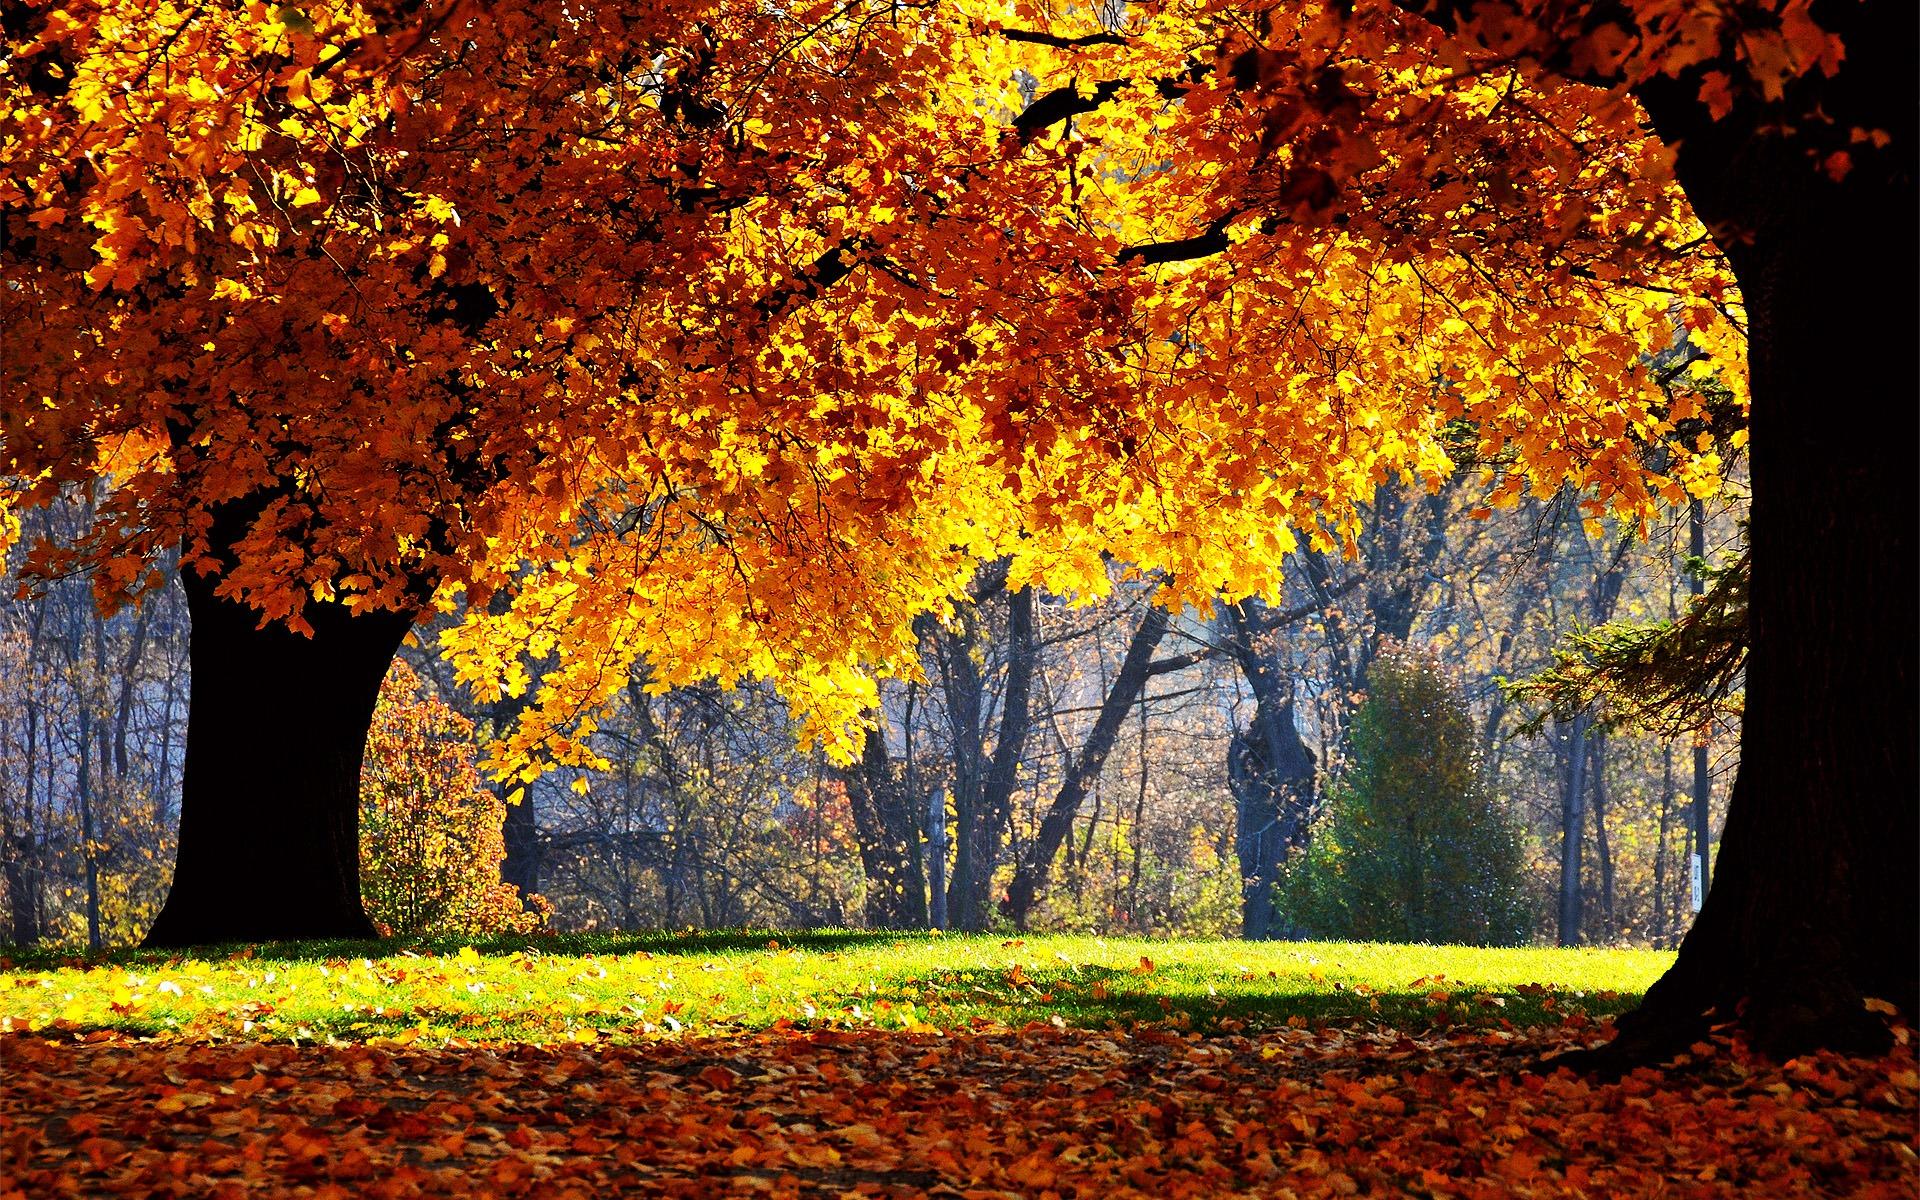 Fall Wallpapers Desktop | Luoghi da visitare | Pinterest | Fall